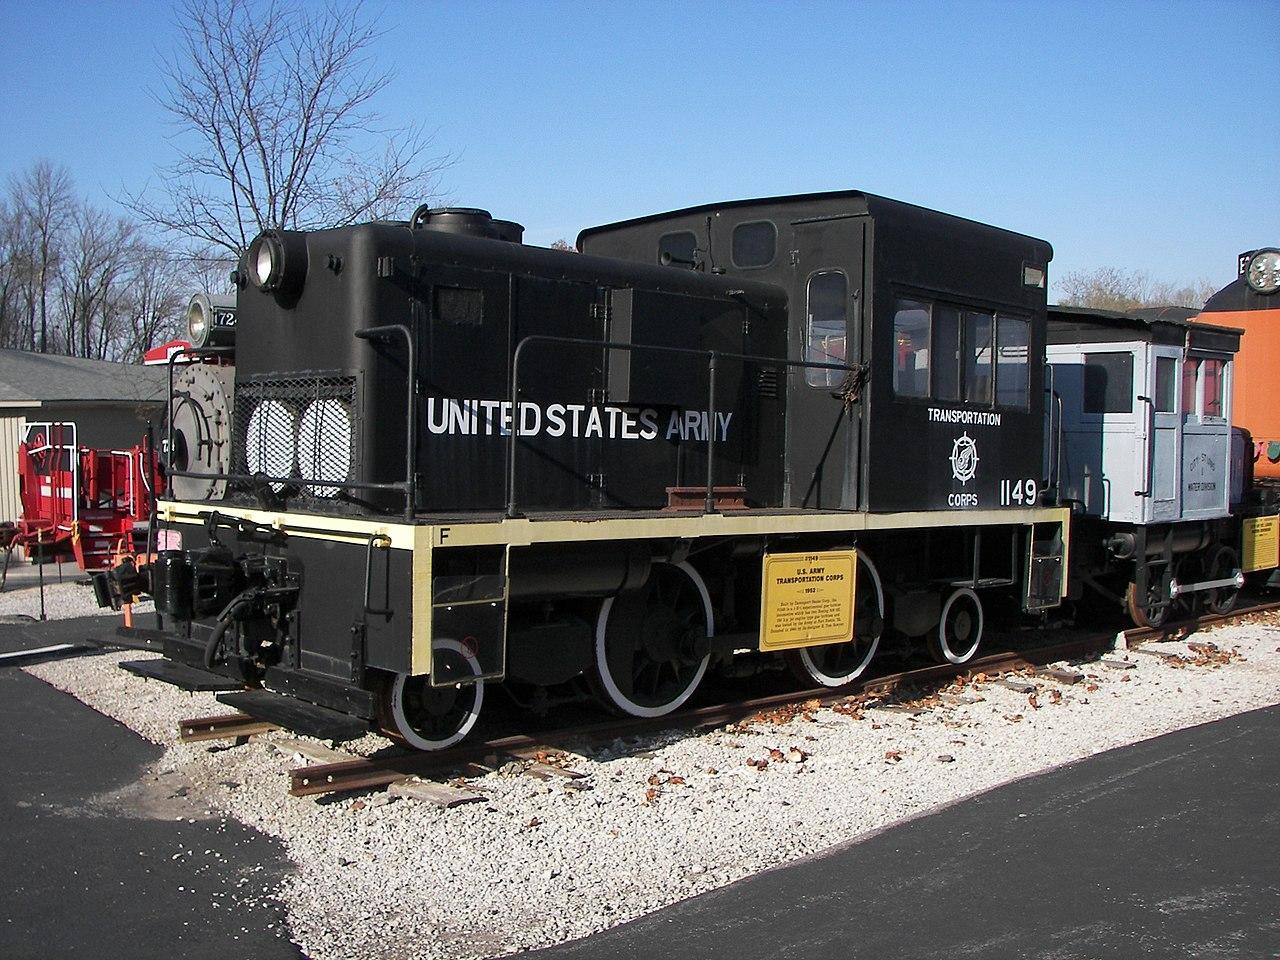 File:Gas turbine locomotive 1149.jpg